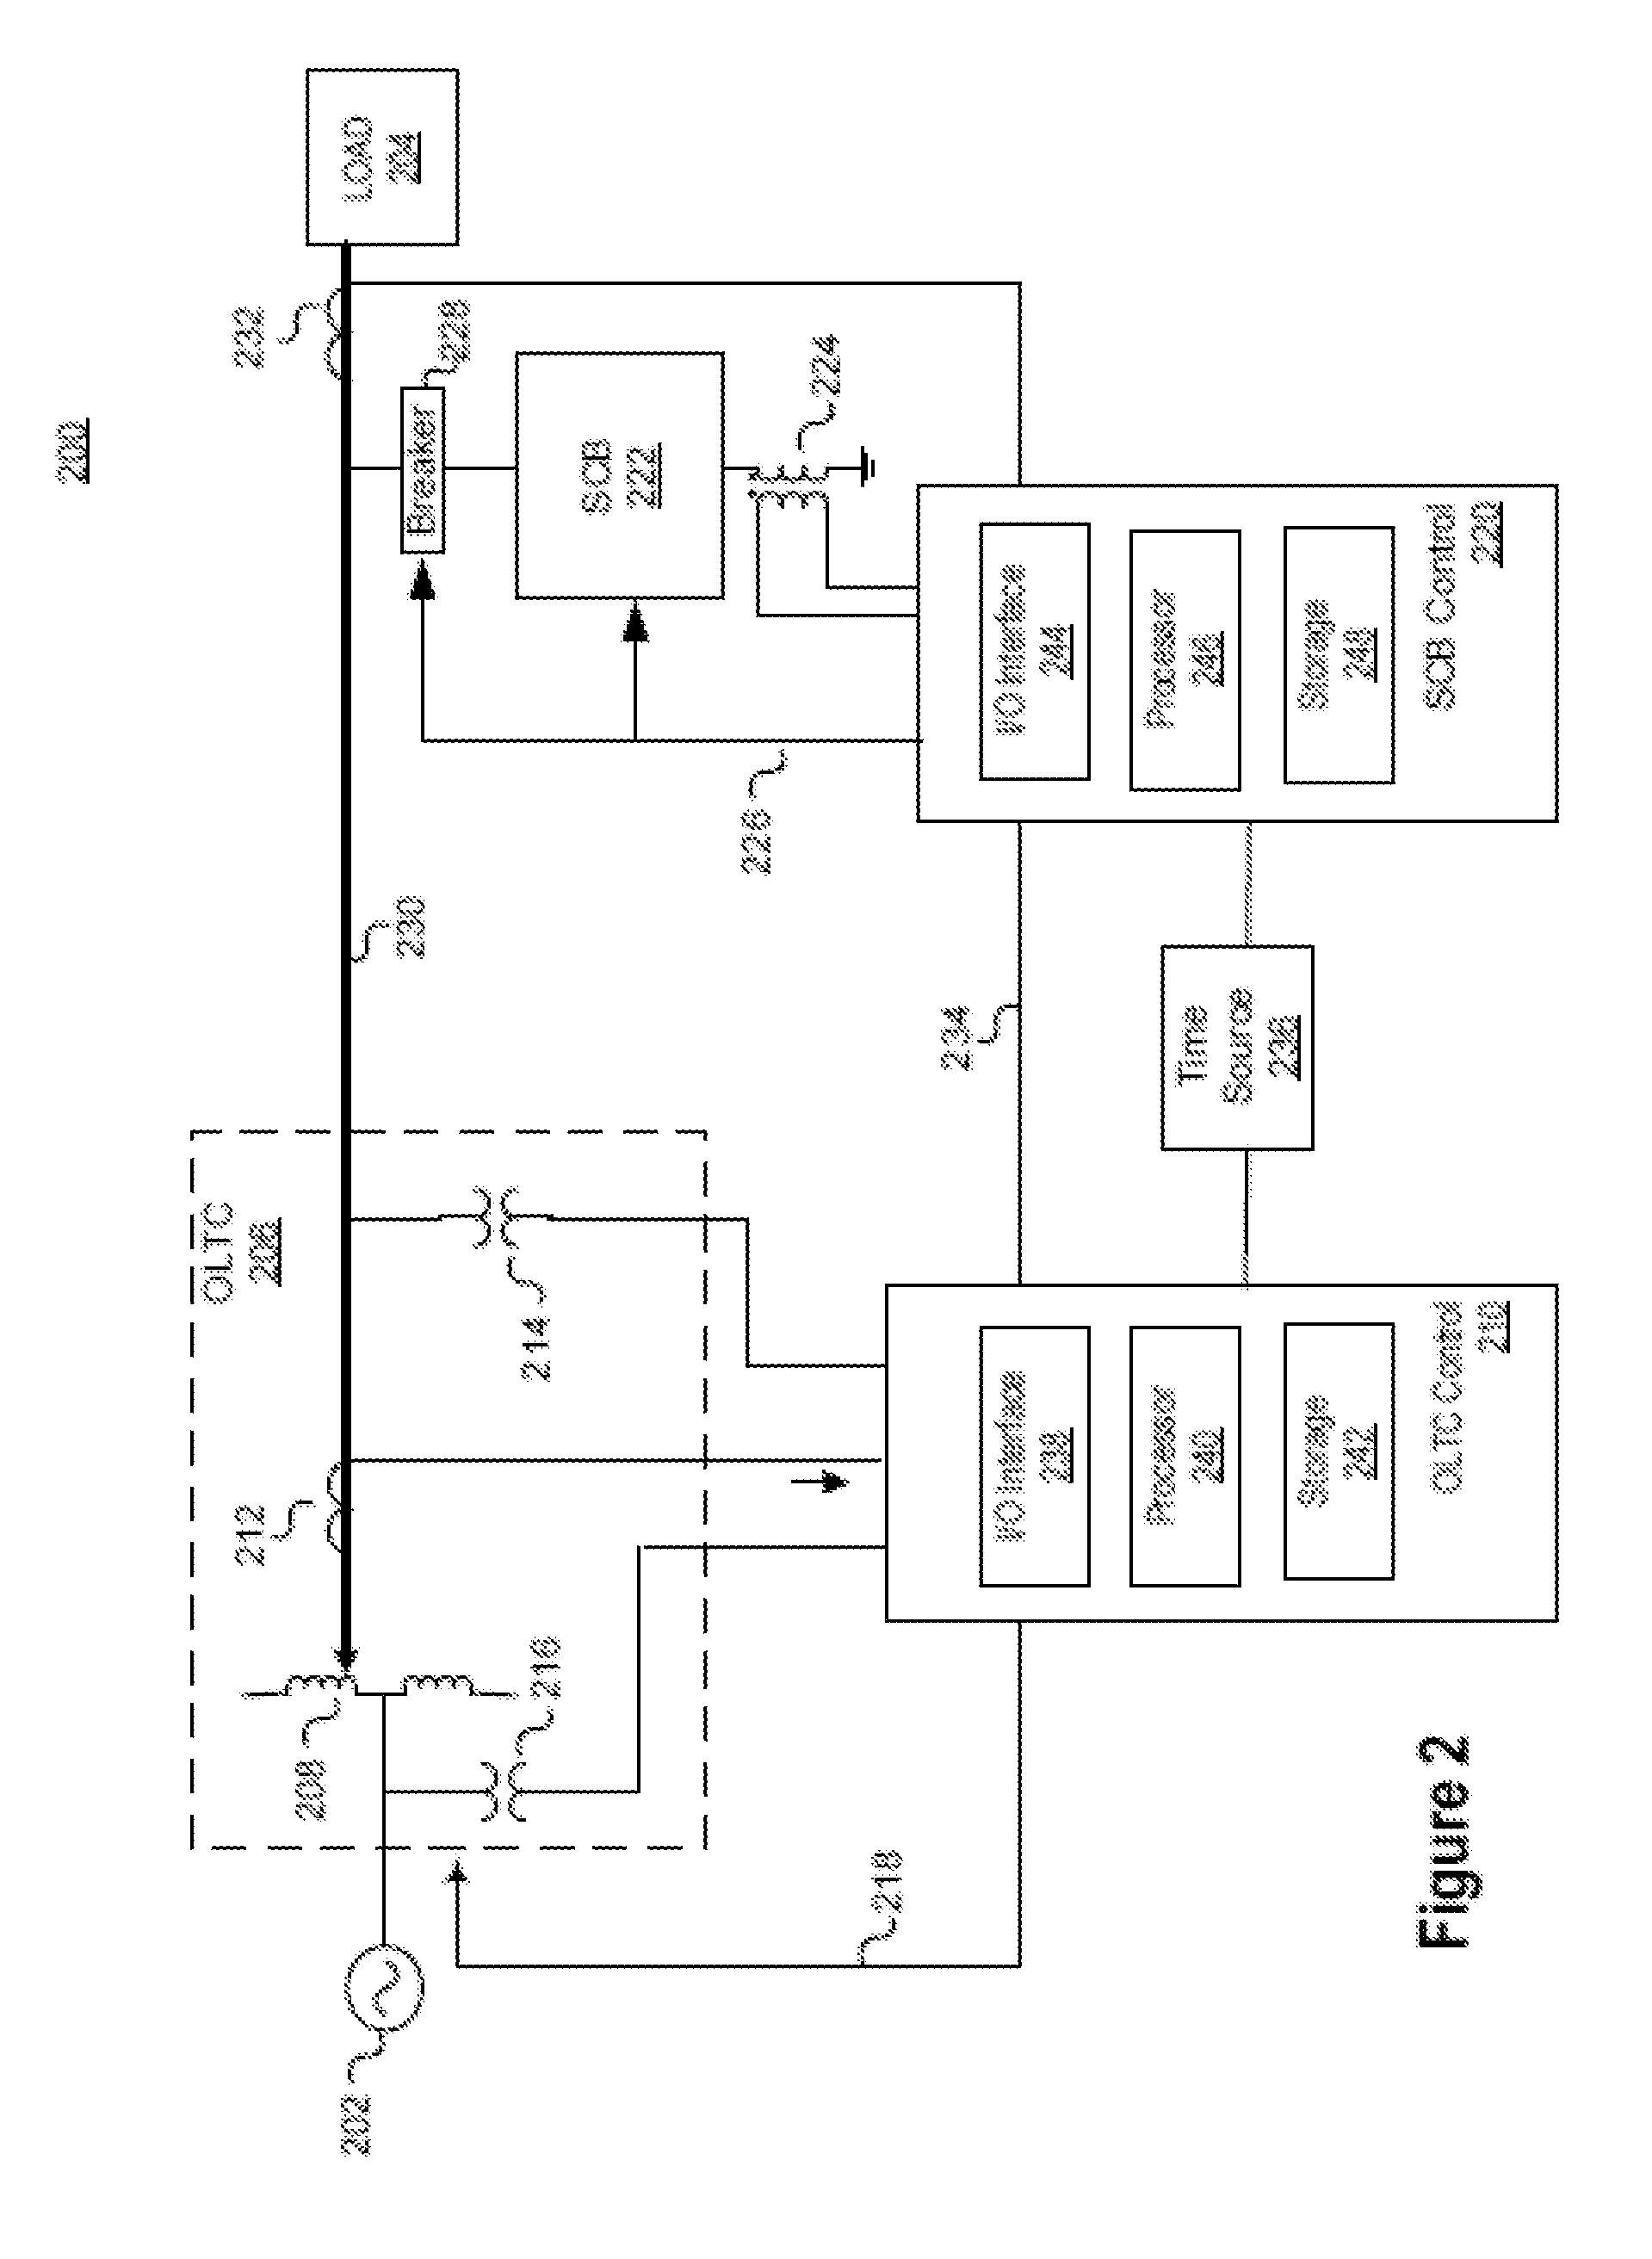 Variable Voltage Transformer | Wiring Diagram Database